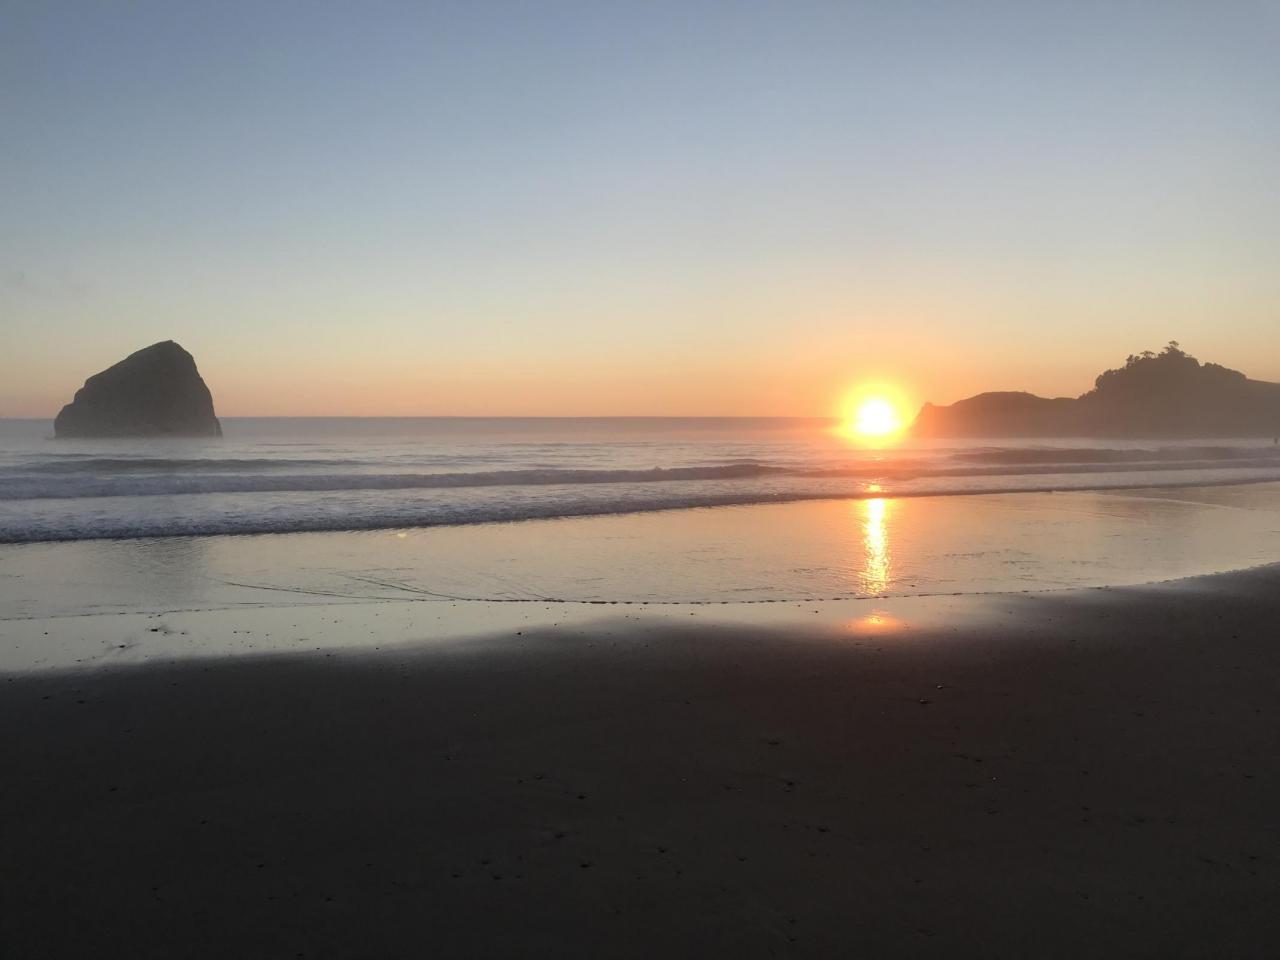 Sunset Cape Kiwanda, July 15, 2021